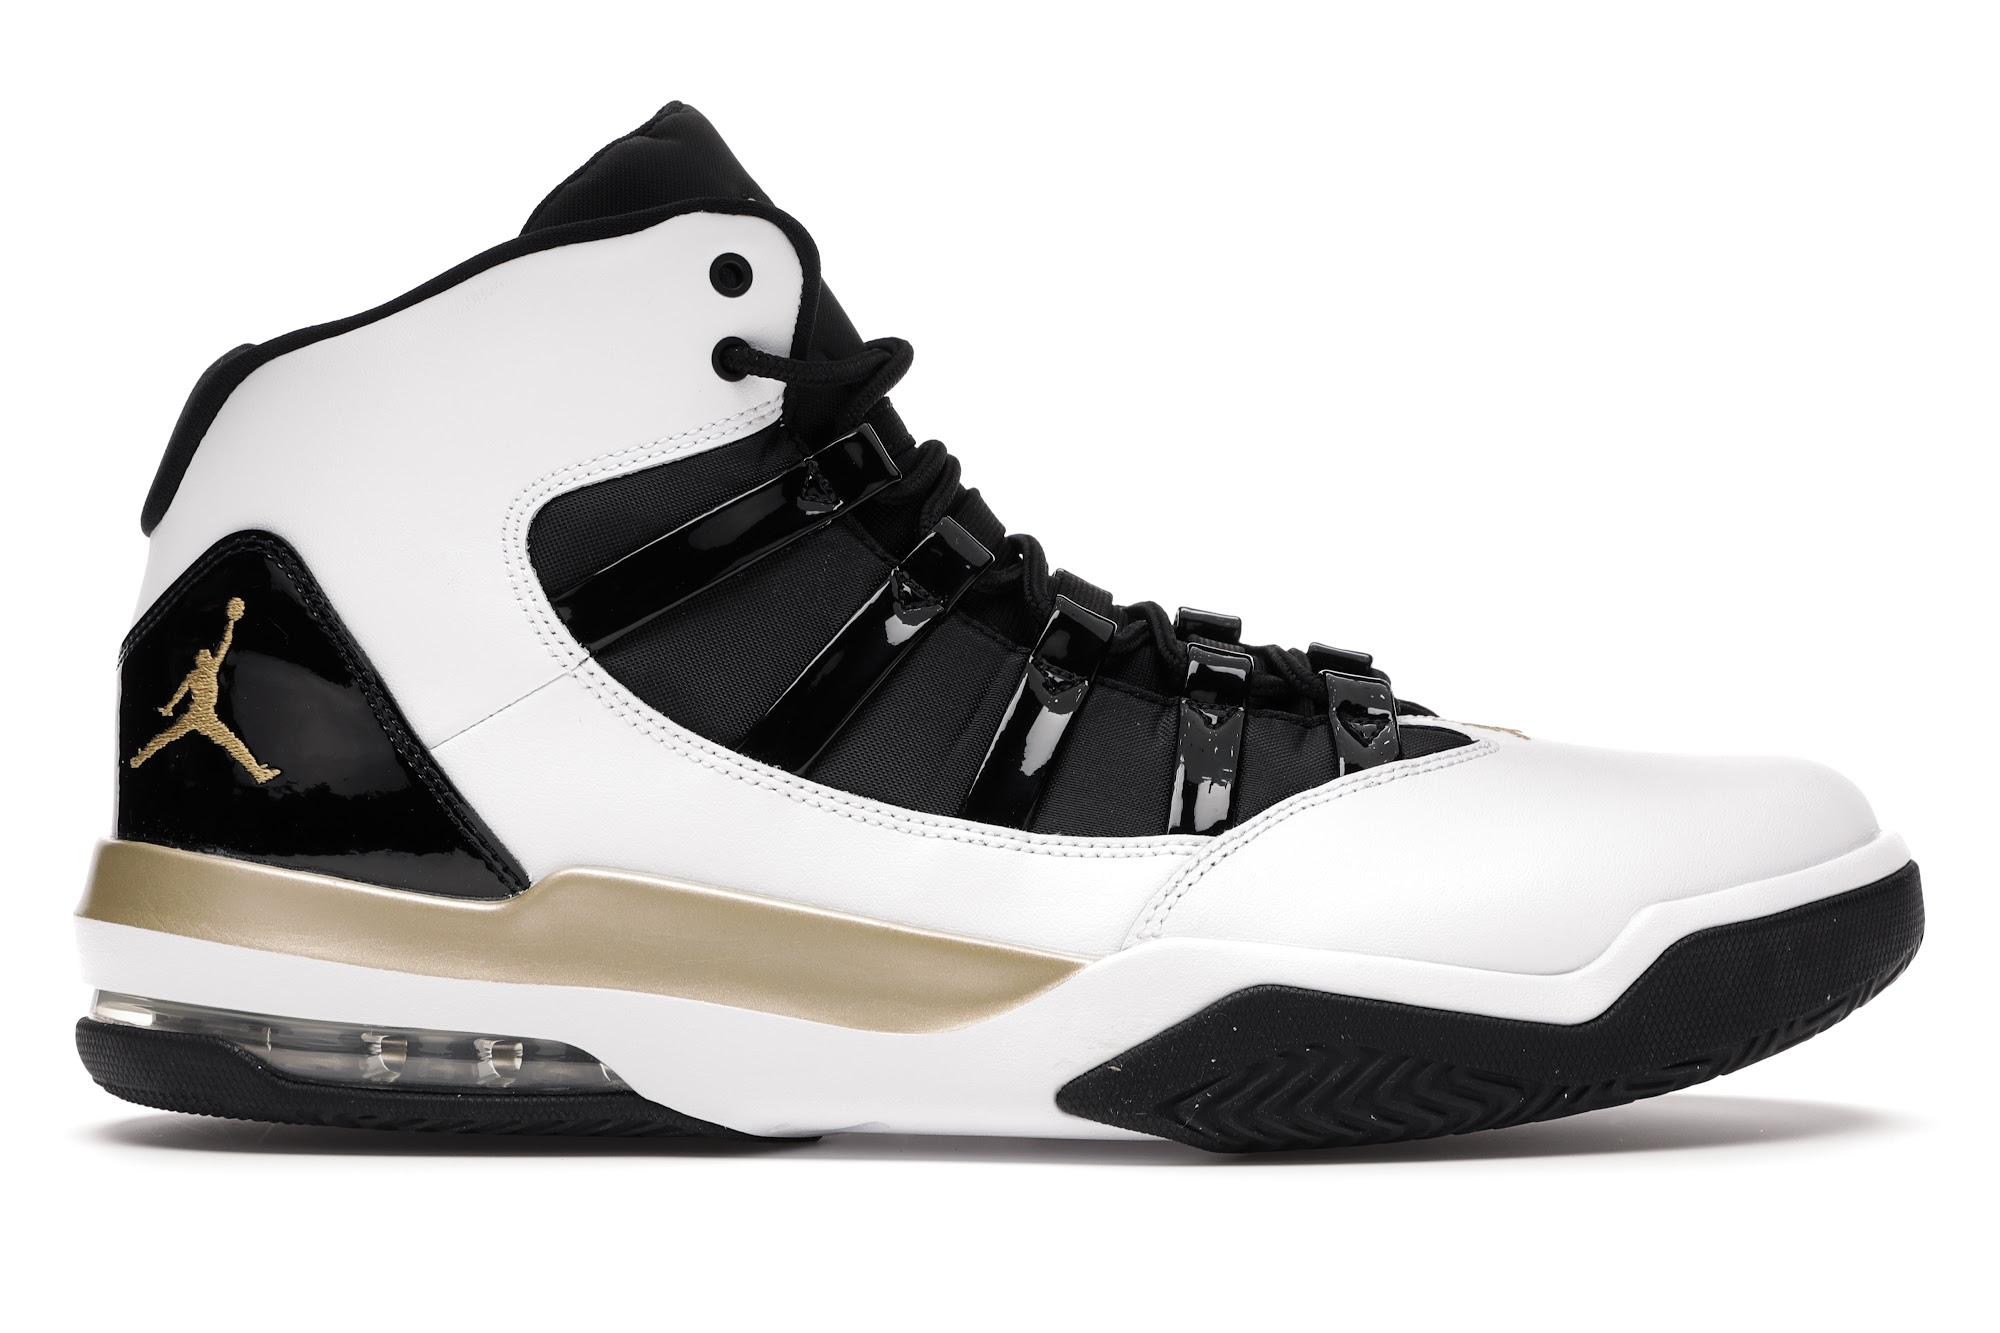 Jordan Max Aura White Metallic Gold Black - AQ9084-107